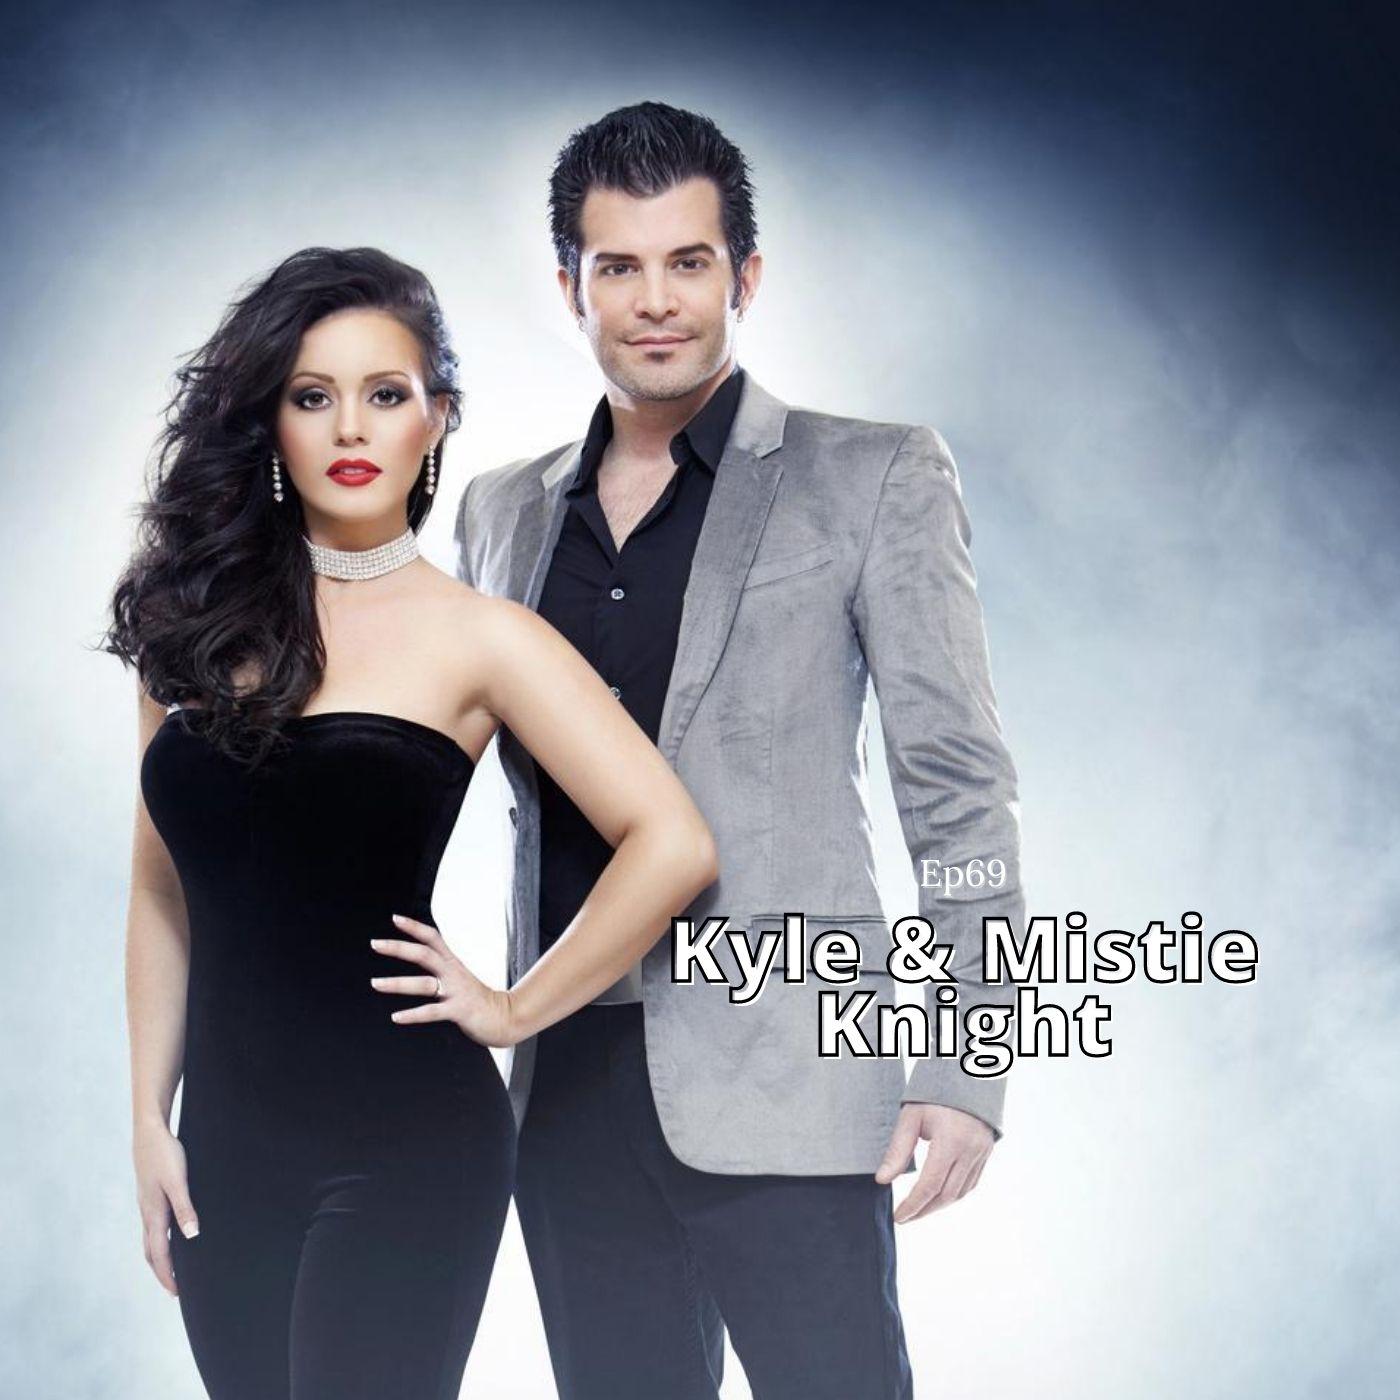 #69 - Kyle & Mistie Knight talk cruise predictions